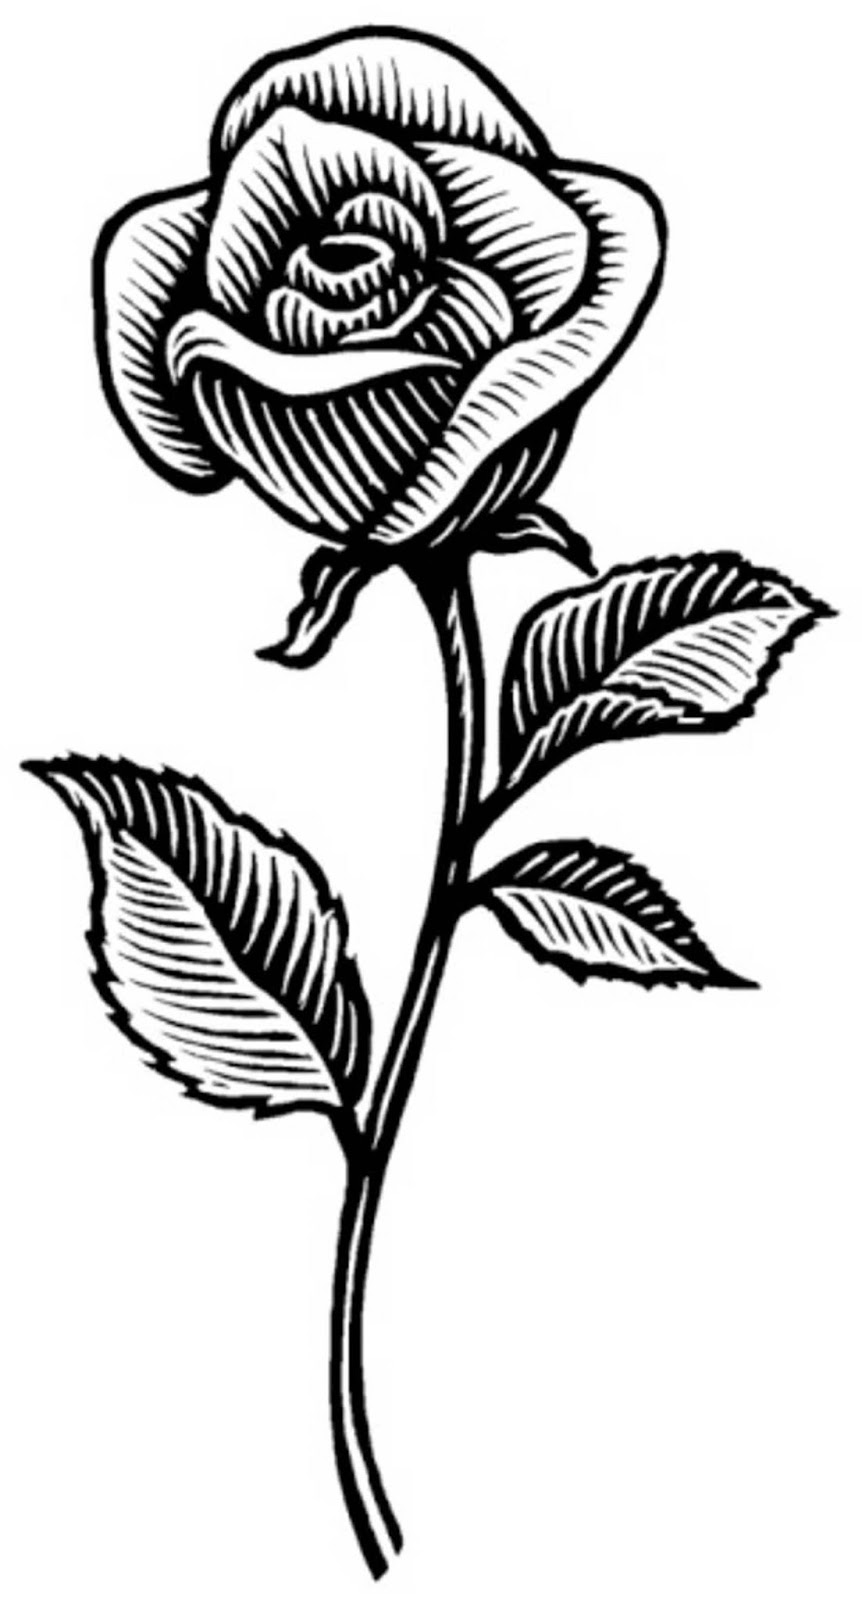 Rosas Para Dibujar Related Keywords - Rosas Para Dibujar ...